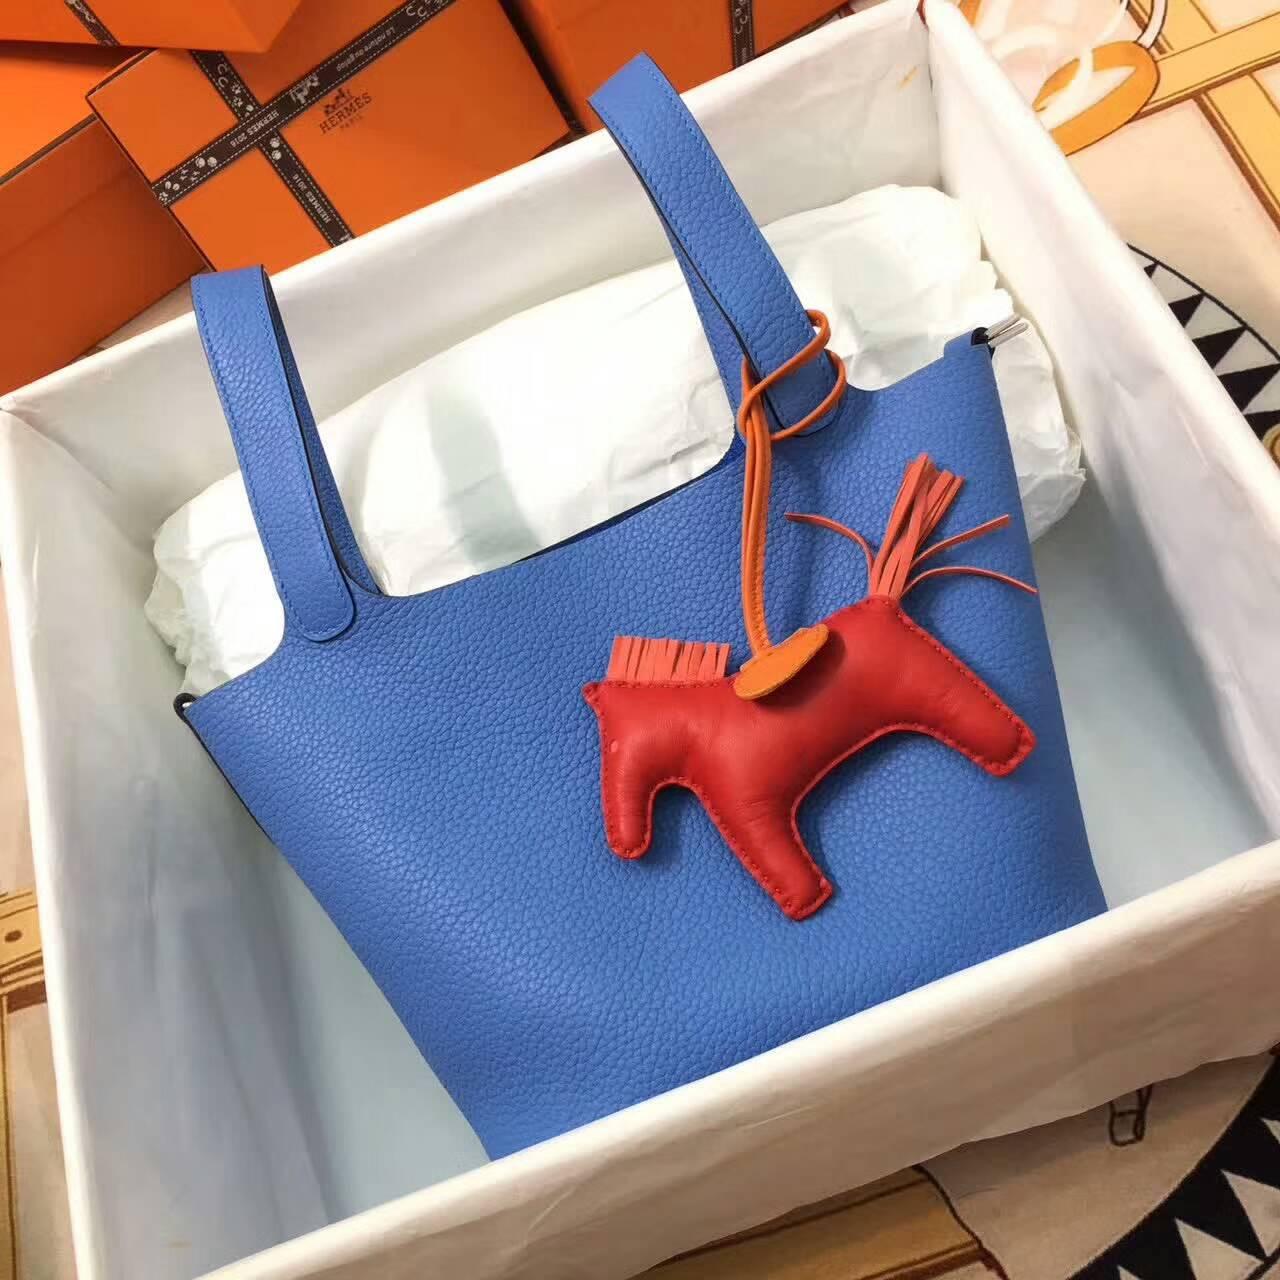 Hermes菜篮子 Picotin Lock 18cm Clemence 法国原产Tc皮 2T Blue Paradis 天堂蓝 银扣